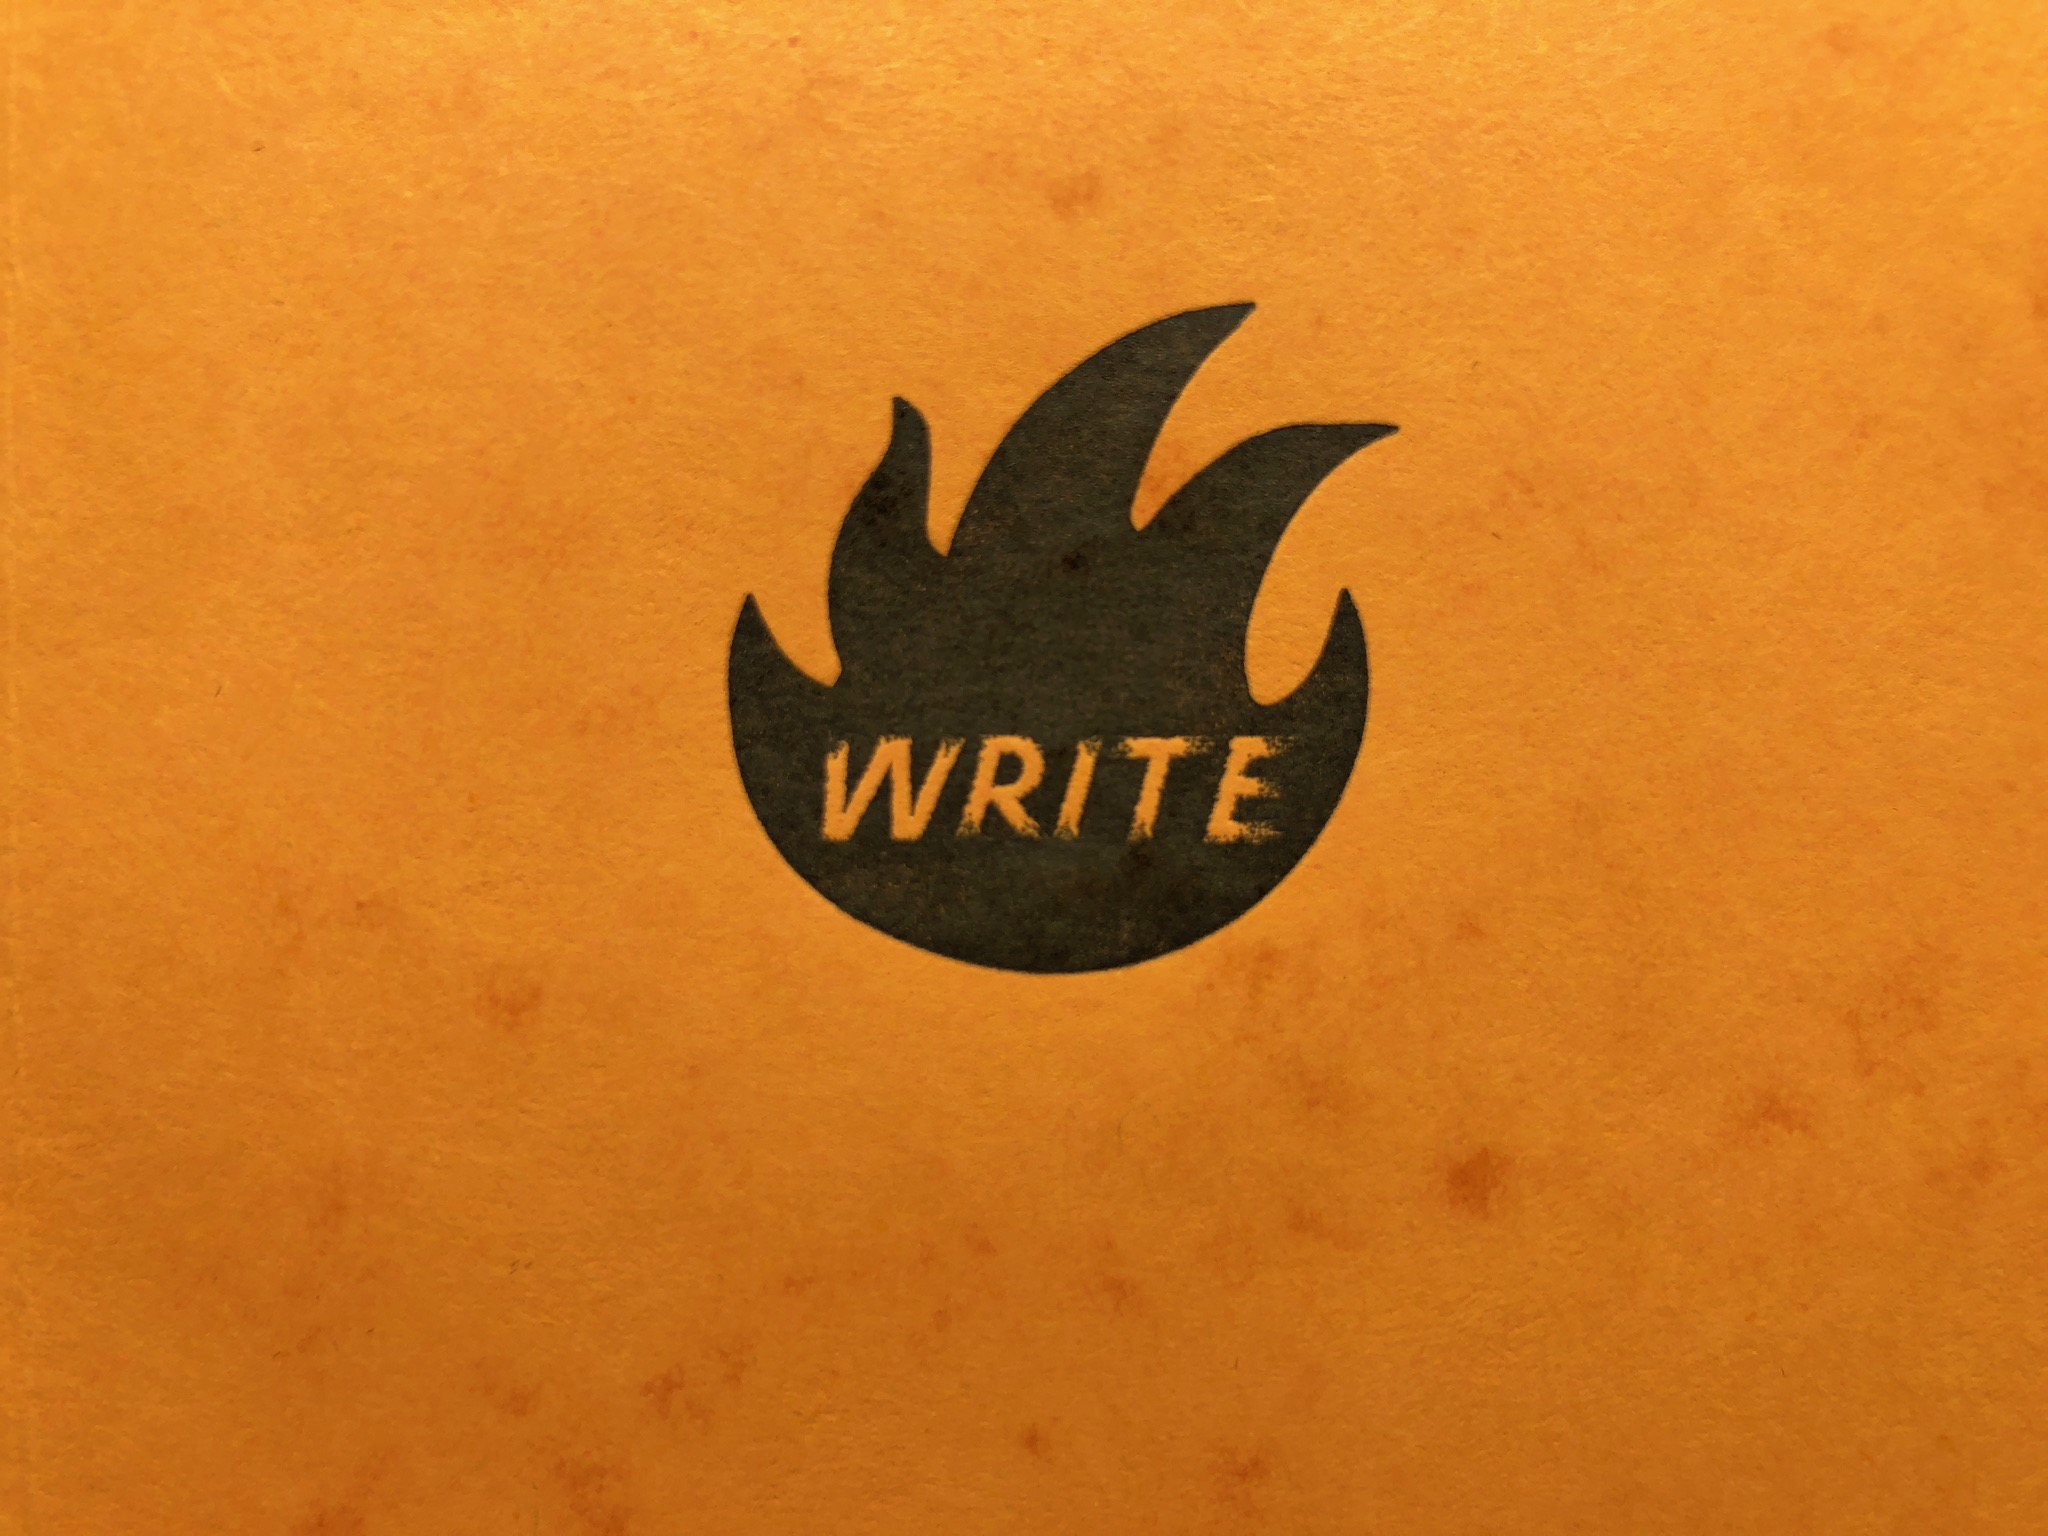 write-notepads-kindred-spirit-notebook-8.jpg